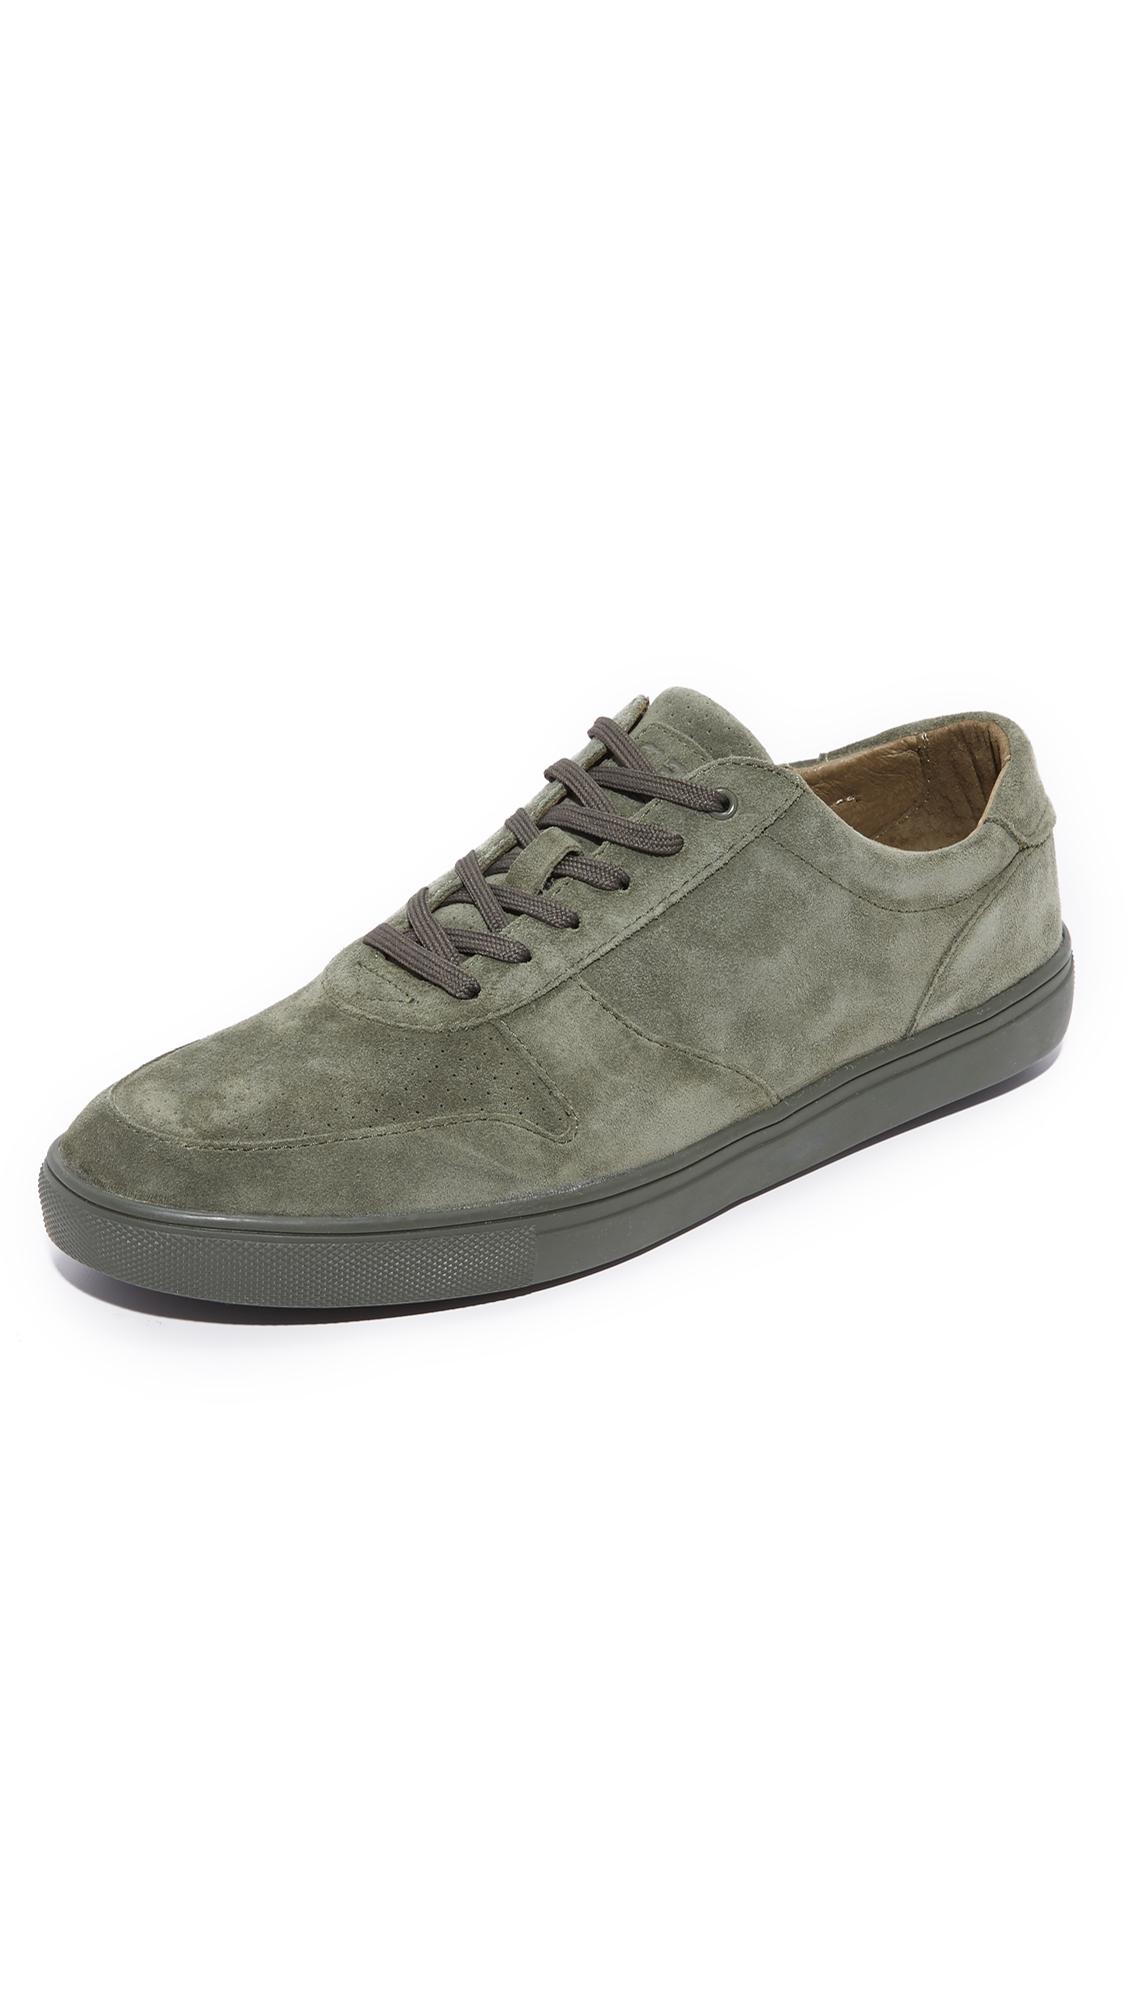 Buy Clae Shoes Uk